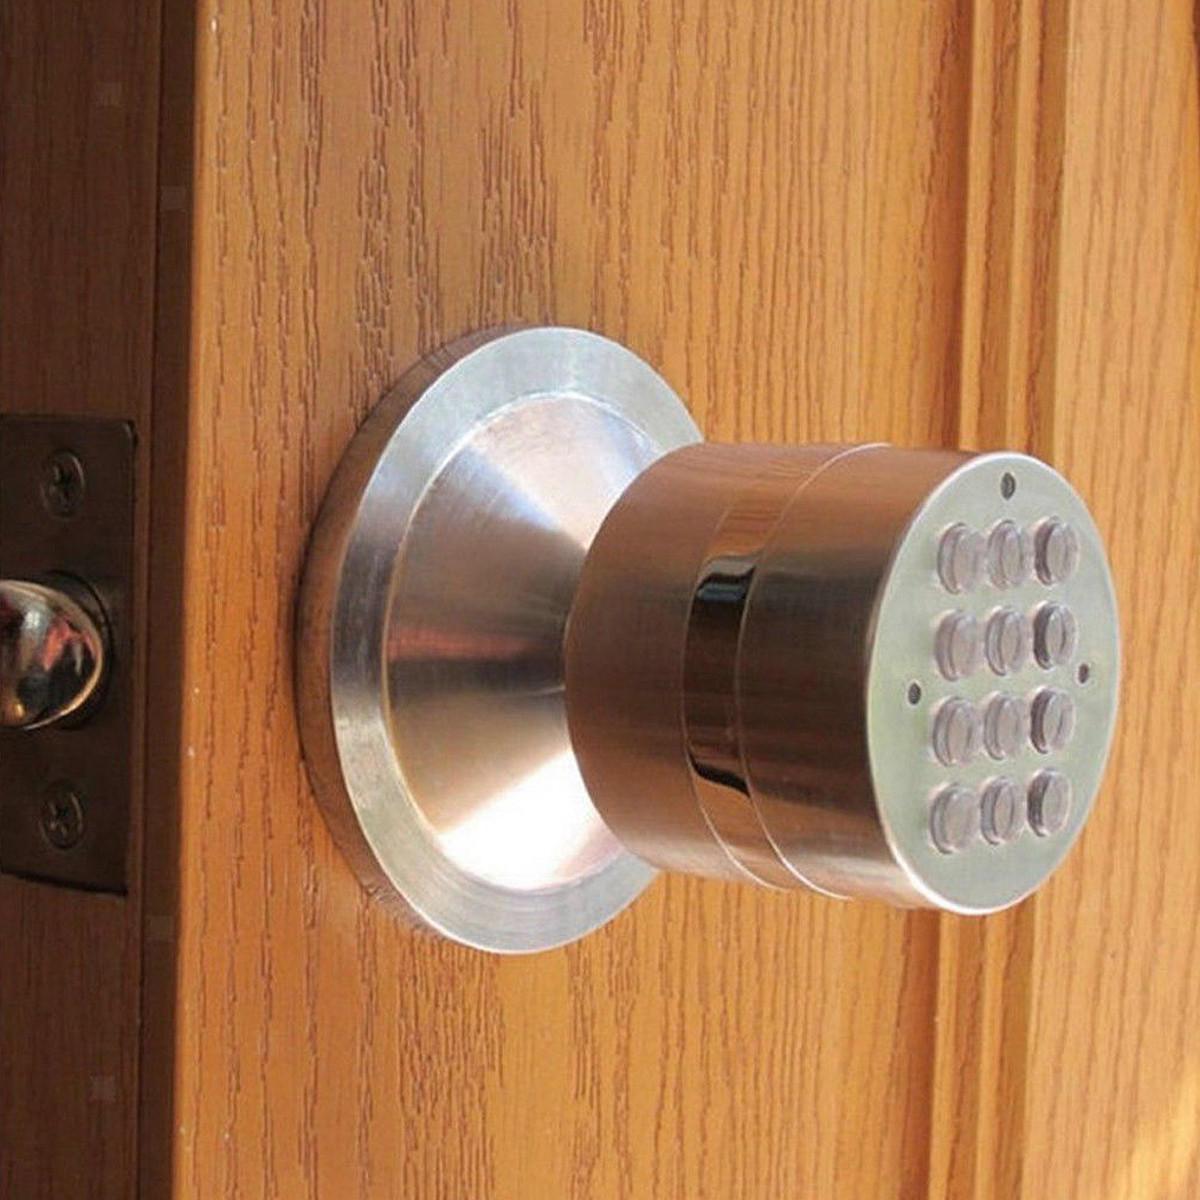 Electronic Digital Keyless Code Smart Door Lock Keypad Security Handle Home Safety Entry Lock